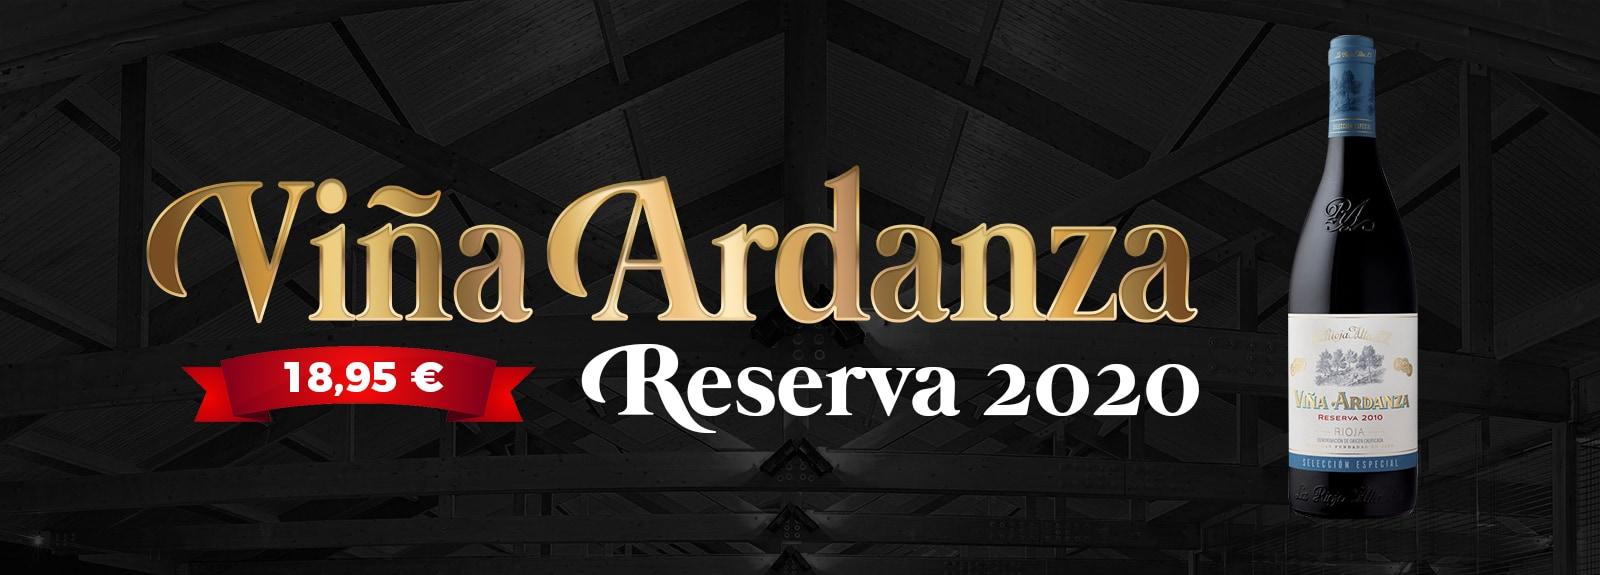 ardanza